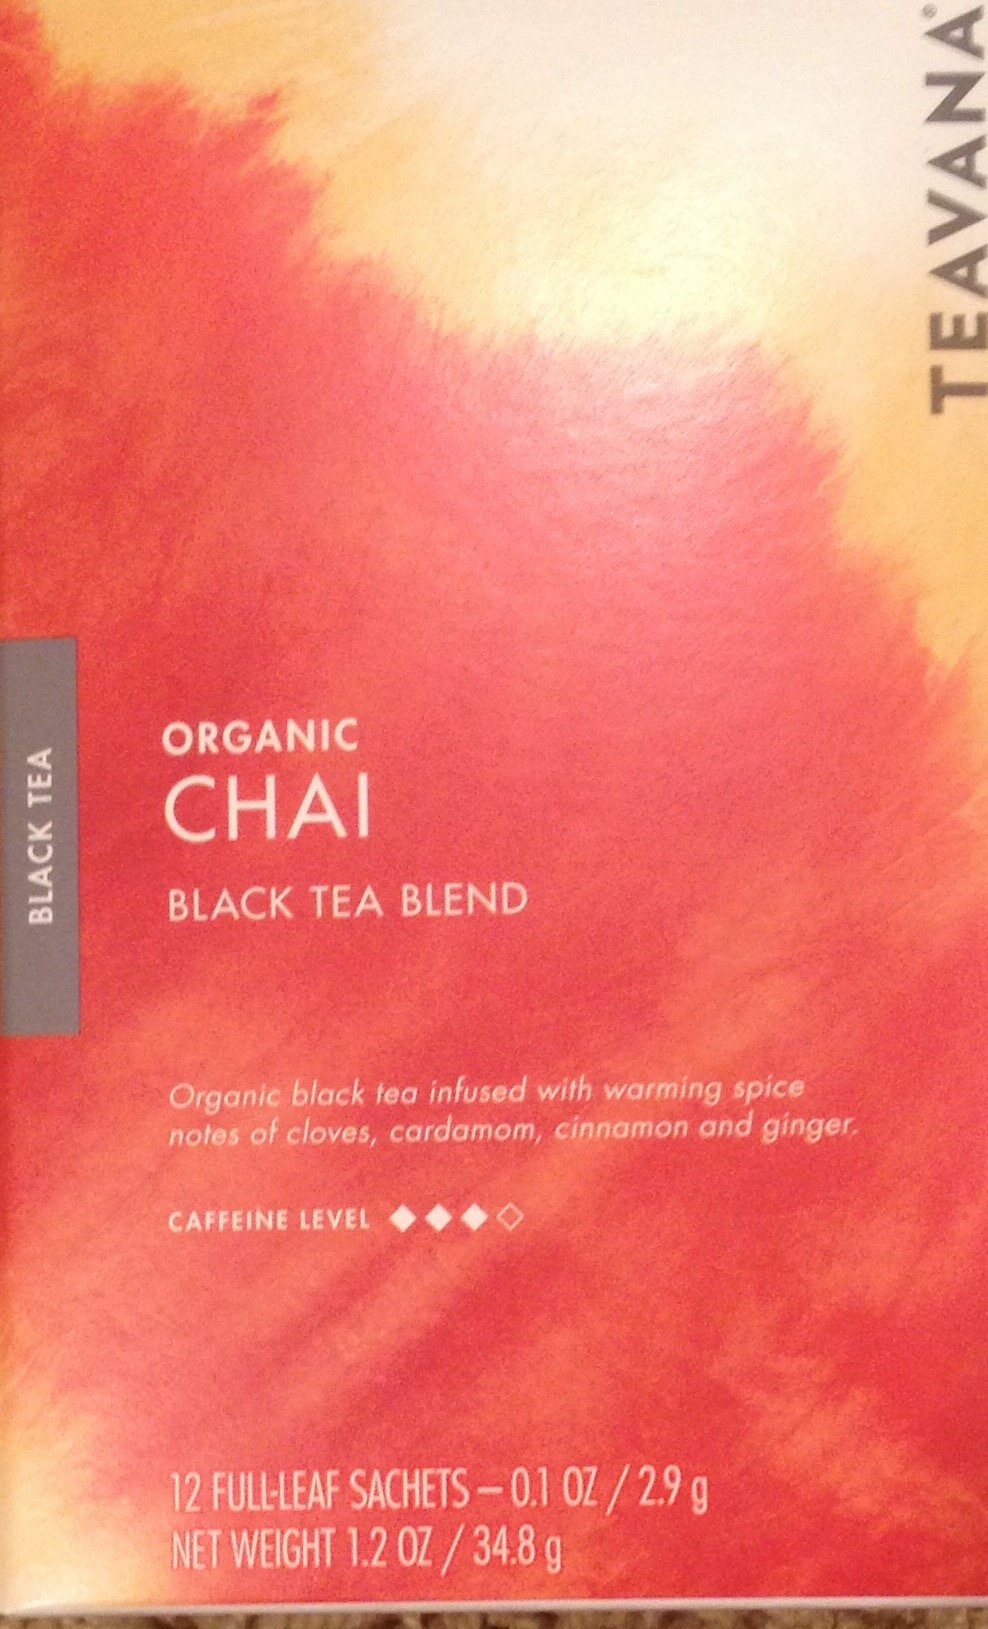 Starbucks Teavana Organic Chai Black Tea Blend - 12 Full-Leaf Sachets